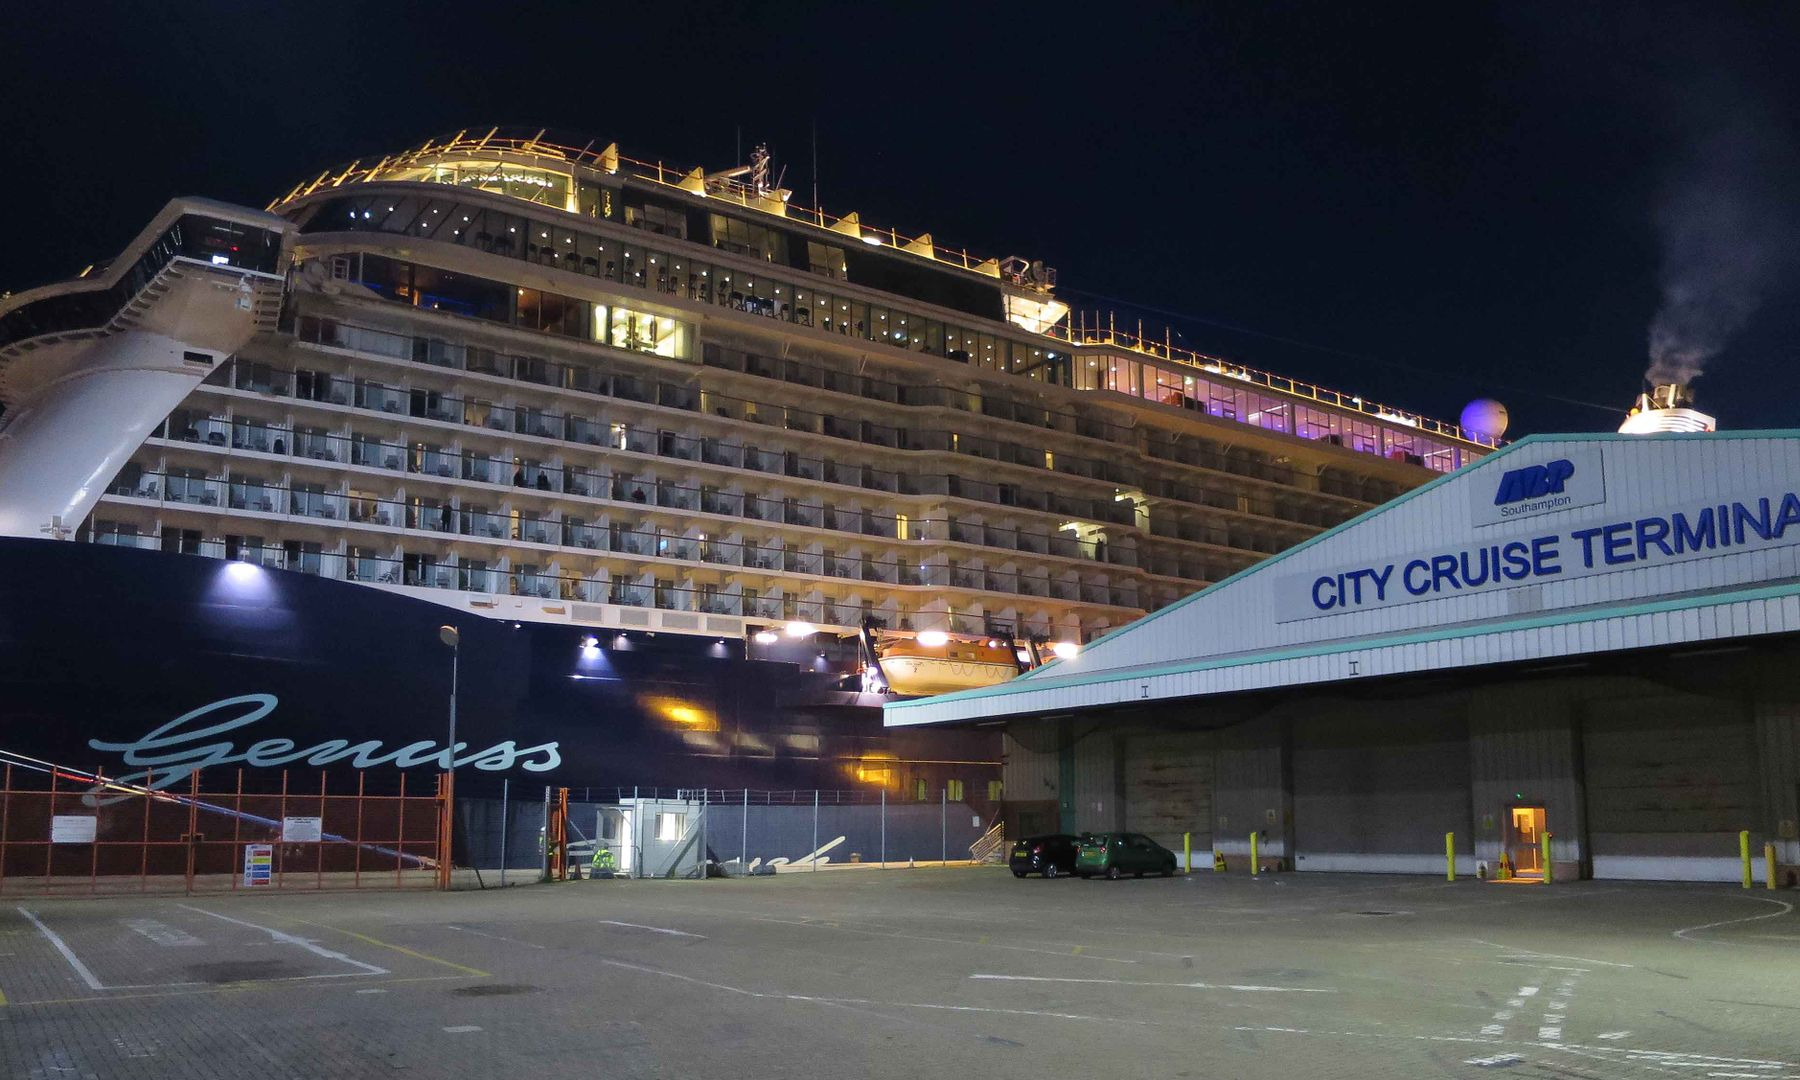 Mein Schiff 3 Southampton